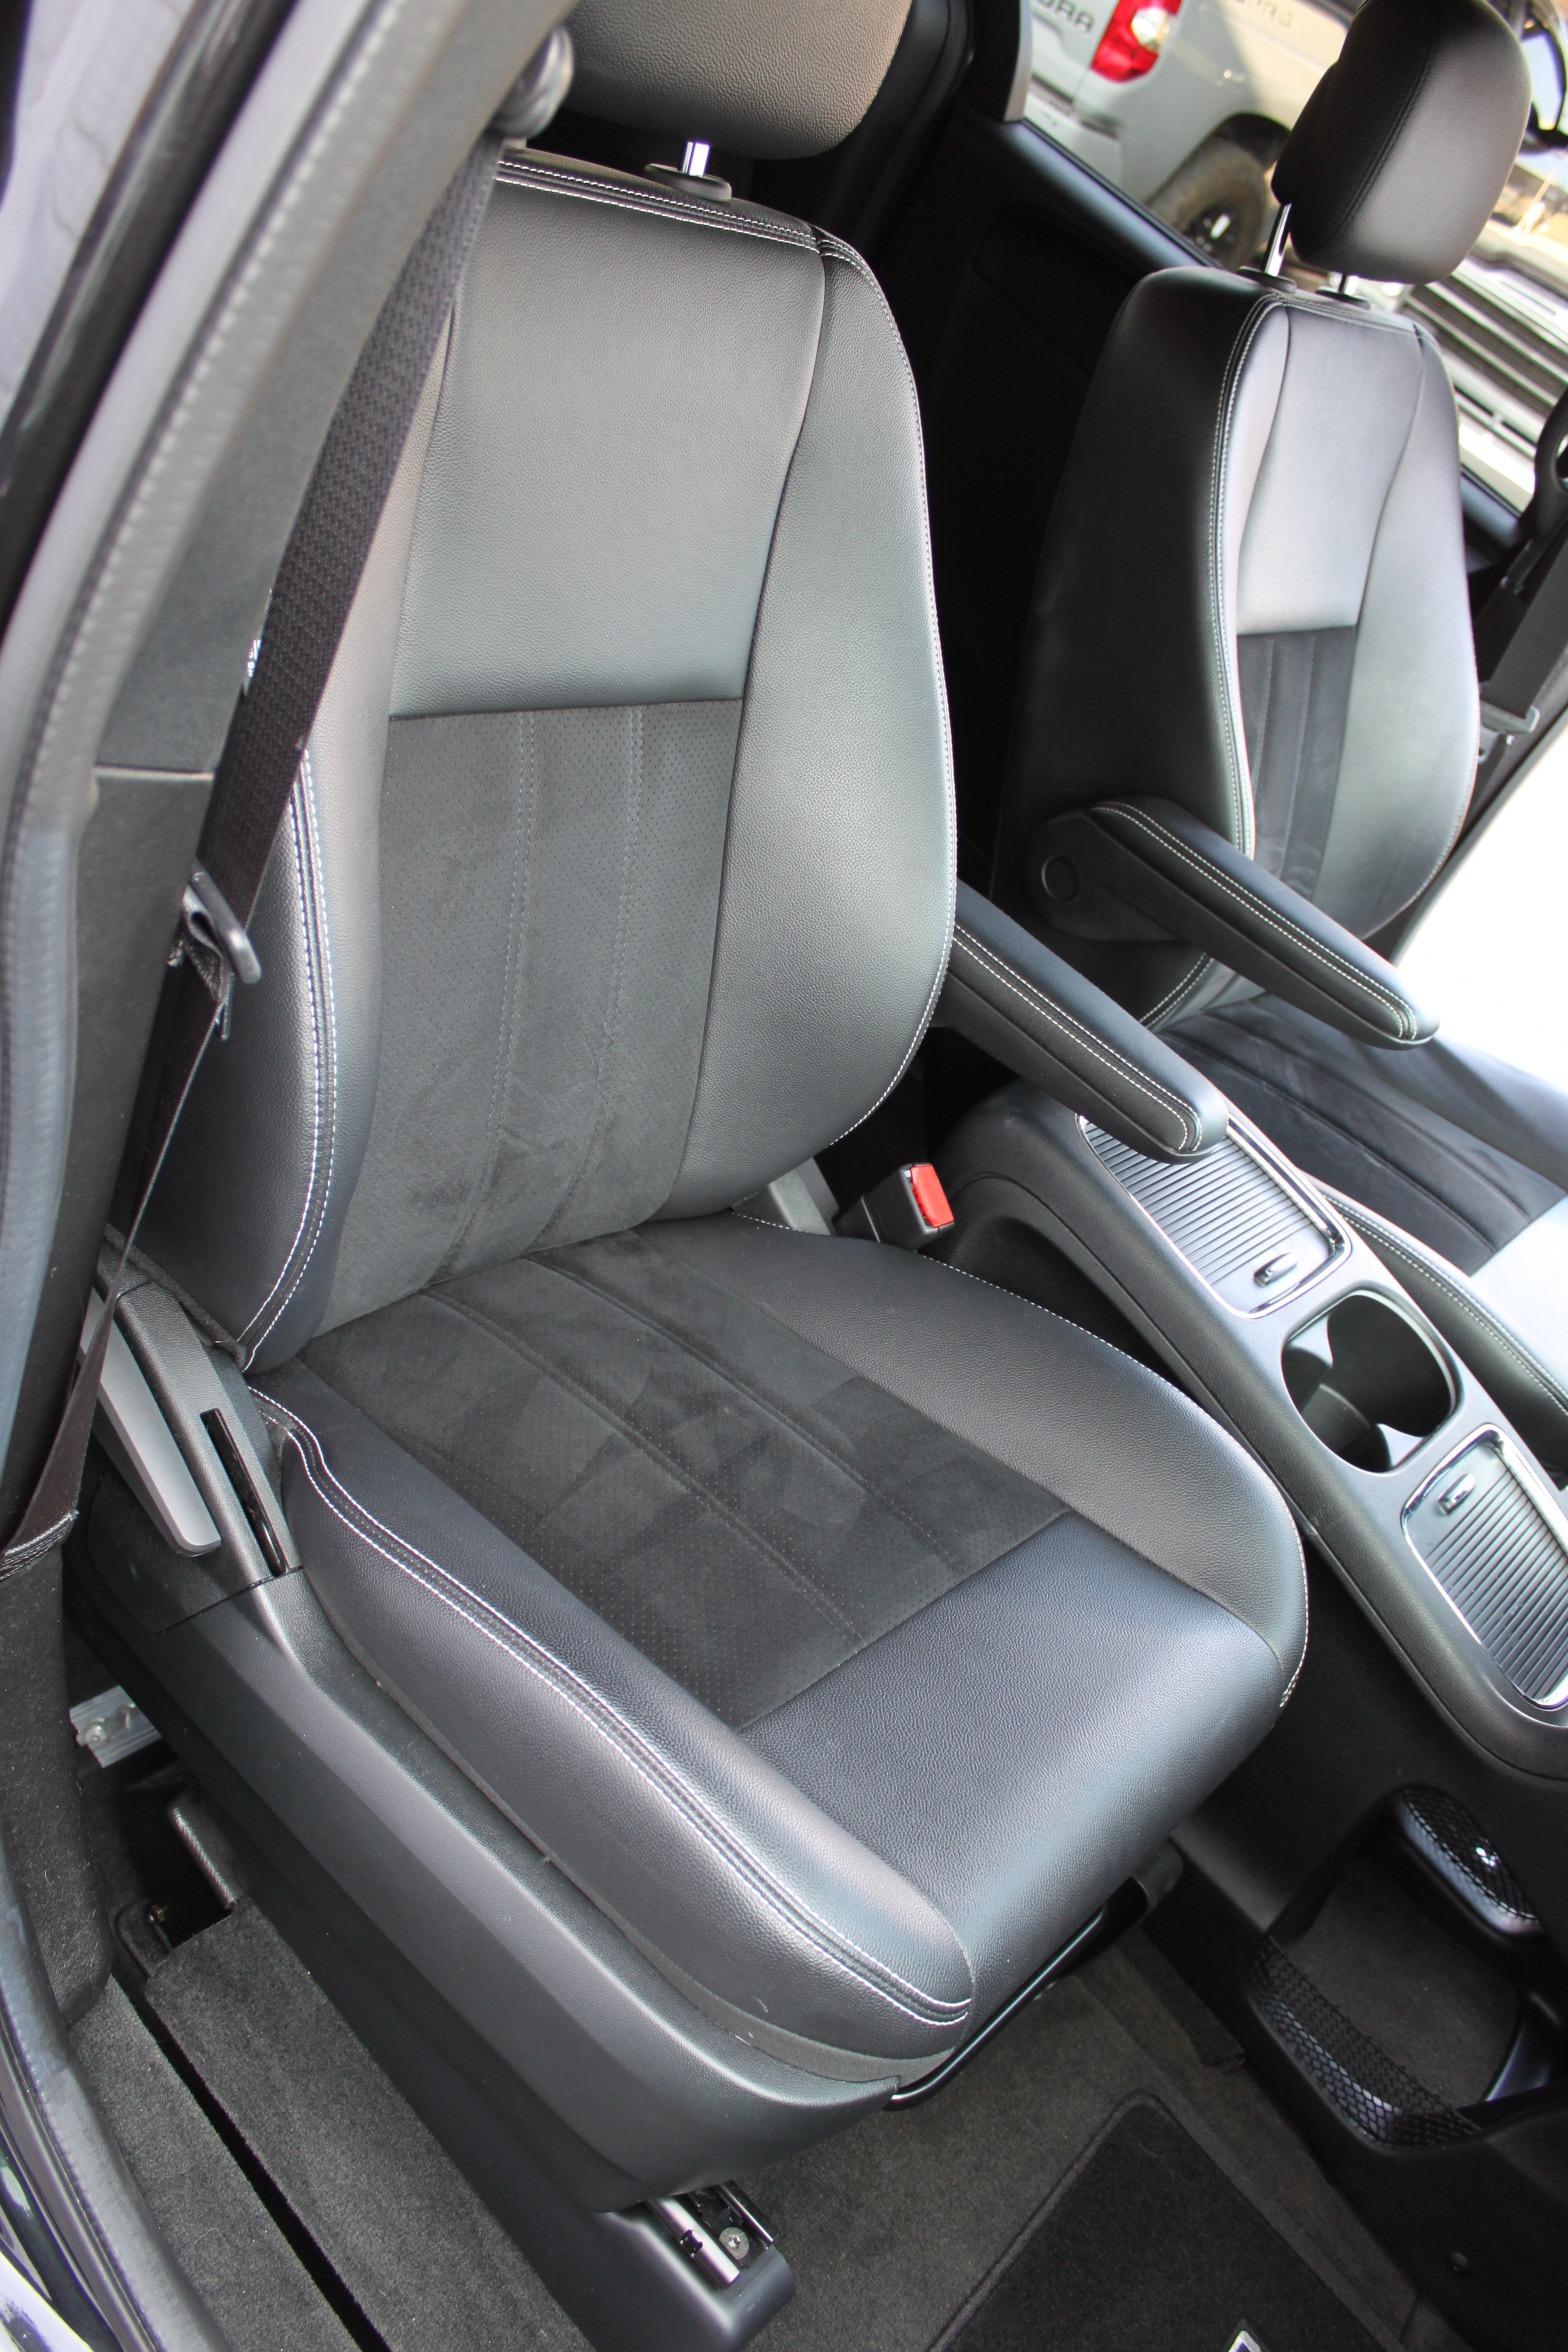 Used-2018-Dodge-Grand-Caravan-SXT-Rollx-Mobility-Conversion-Chrysler